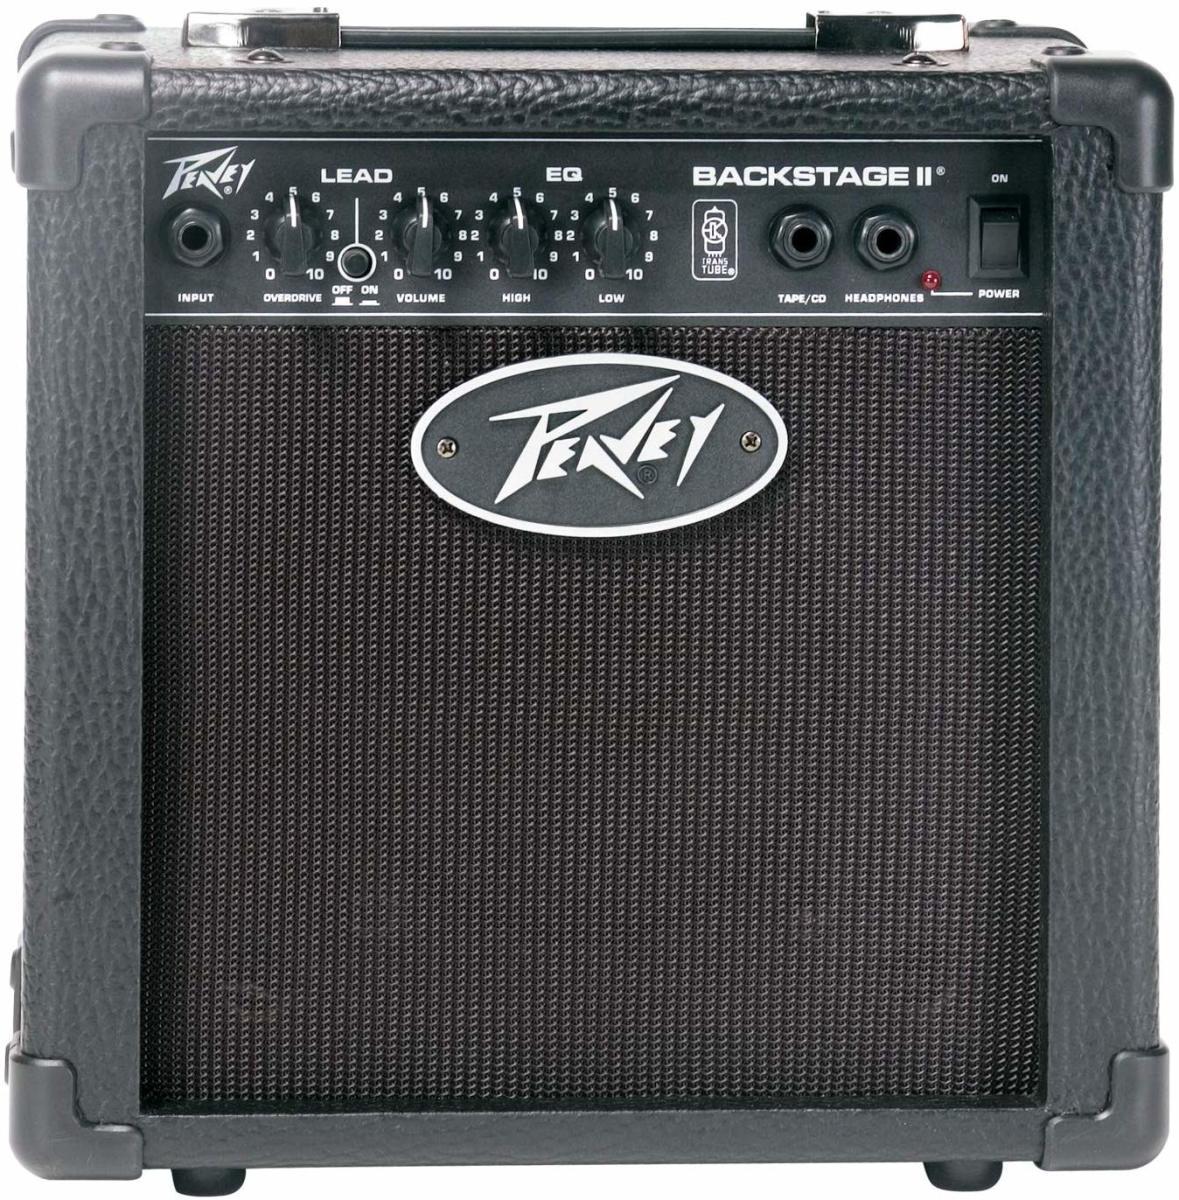 Peavey Backstage 10 Guitar Amp